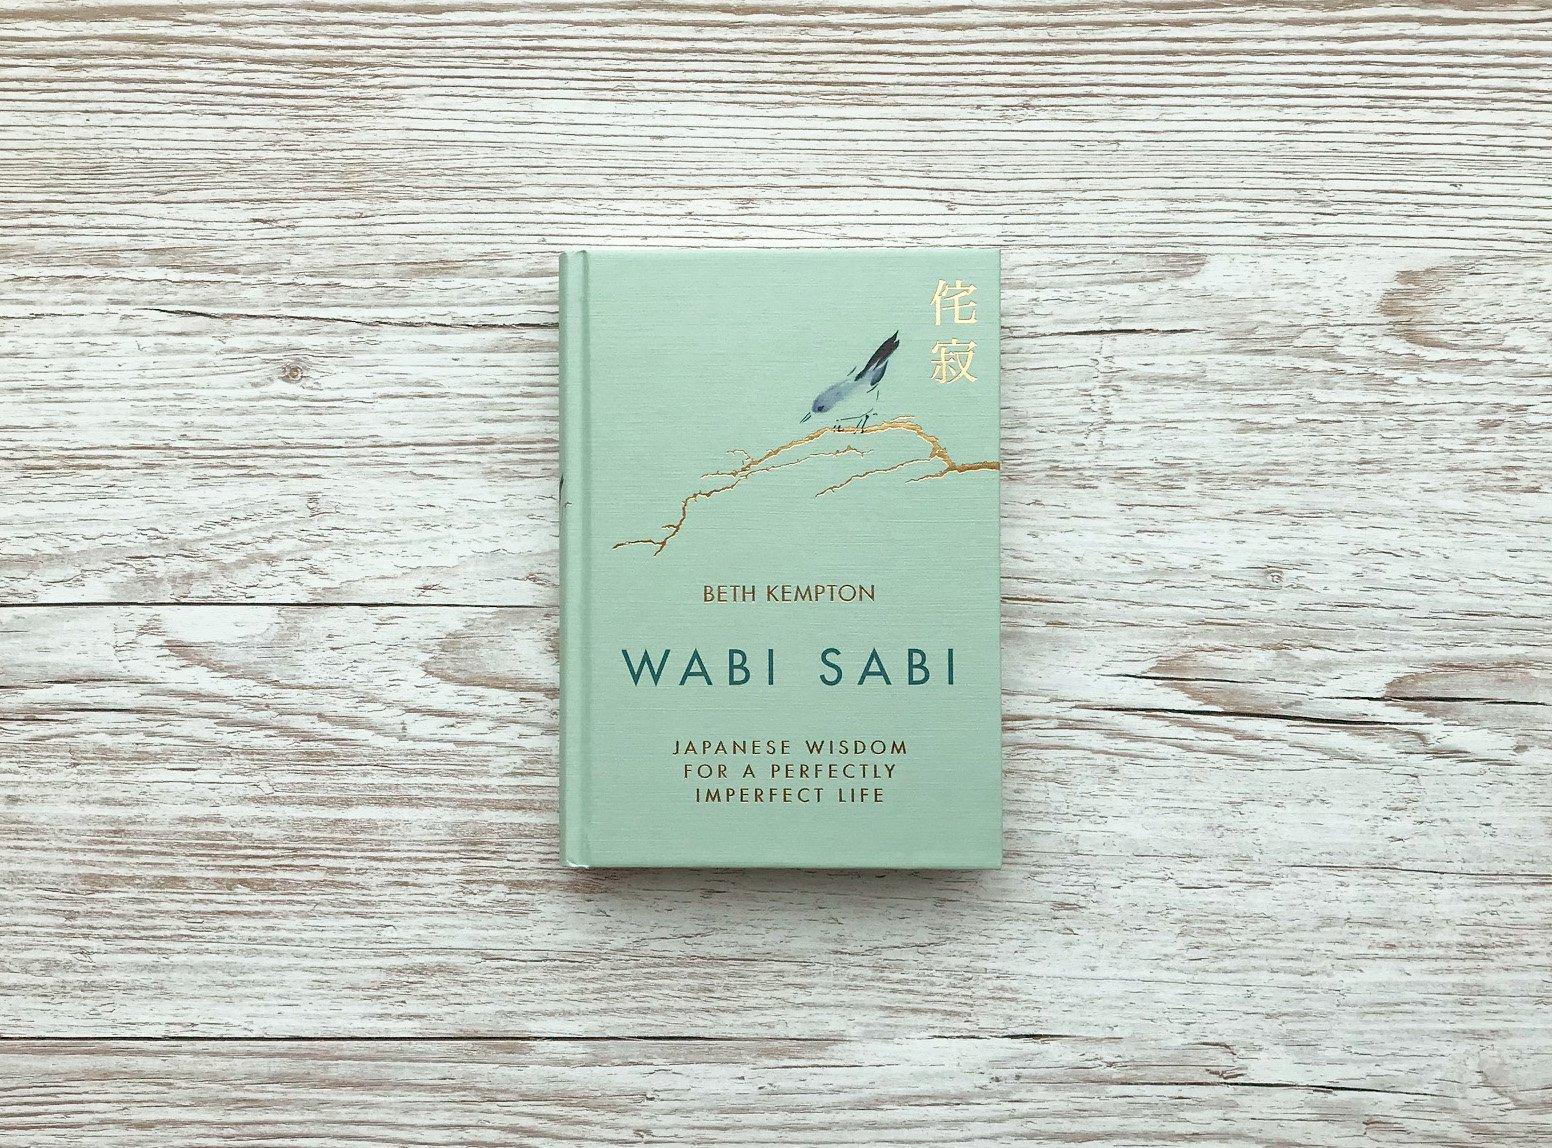 Wabi Sabi Japanese Wisdom For A Perfectly Imperfect Life Beth